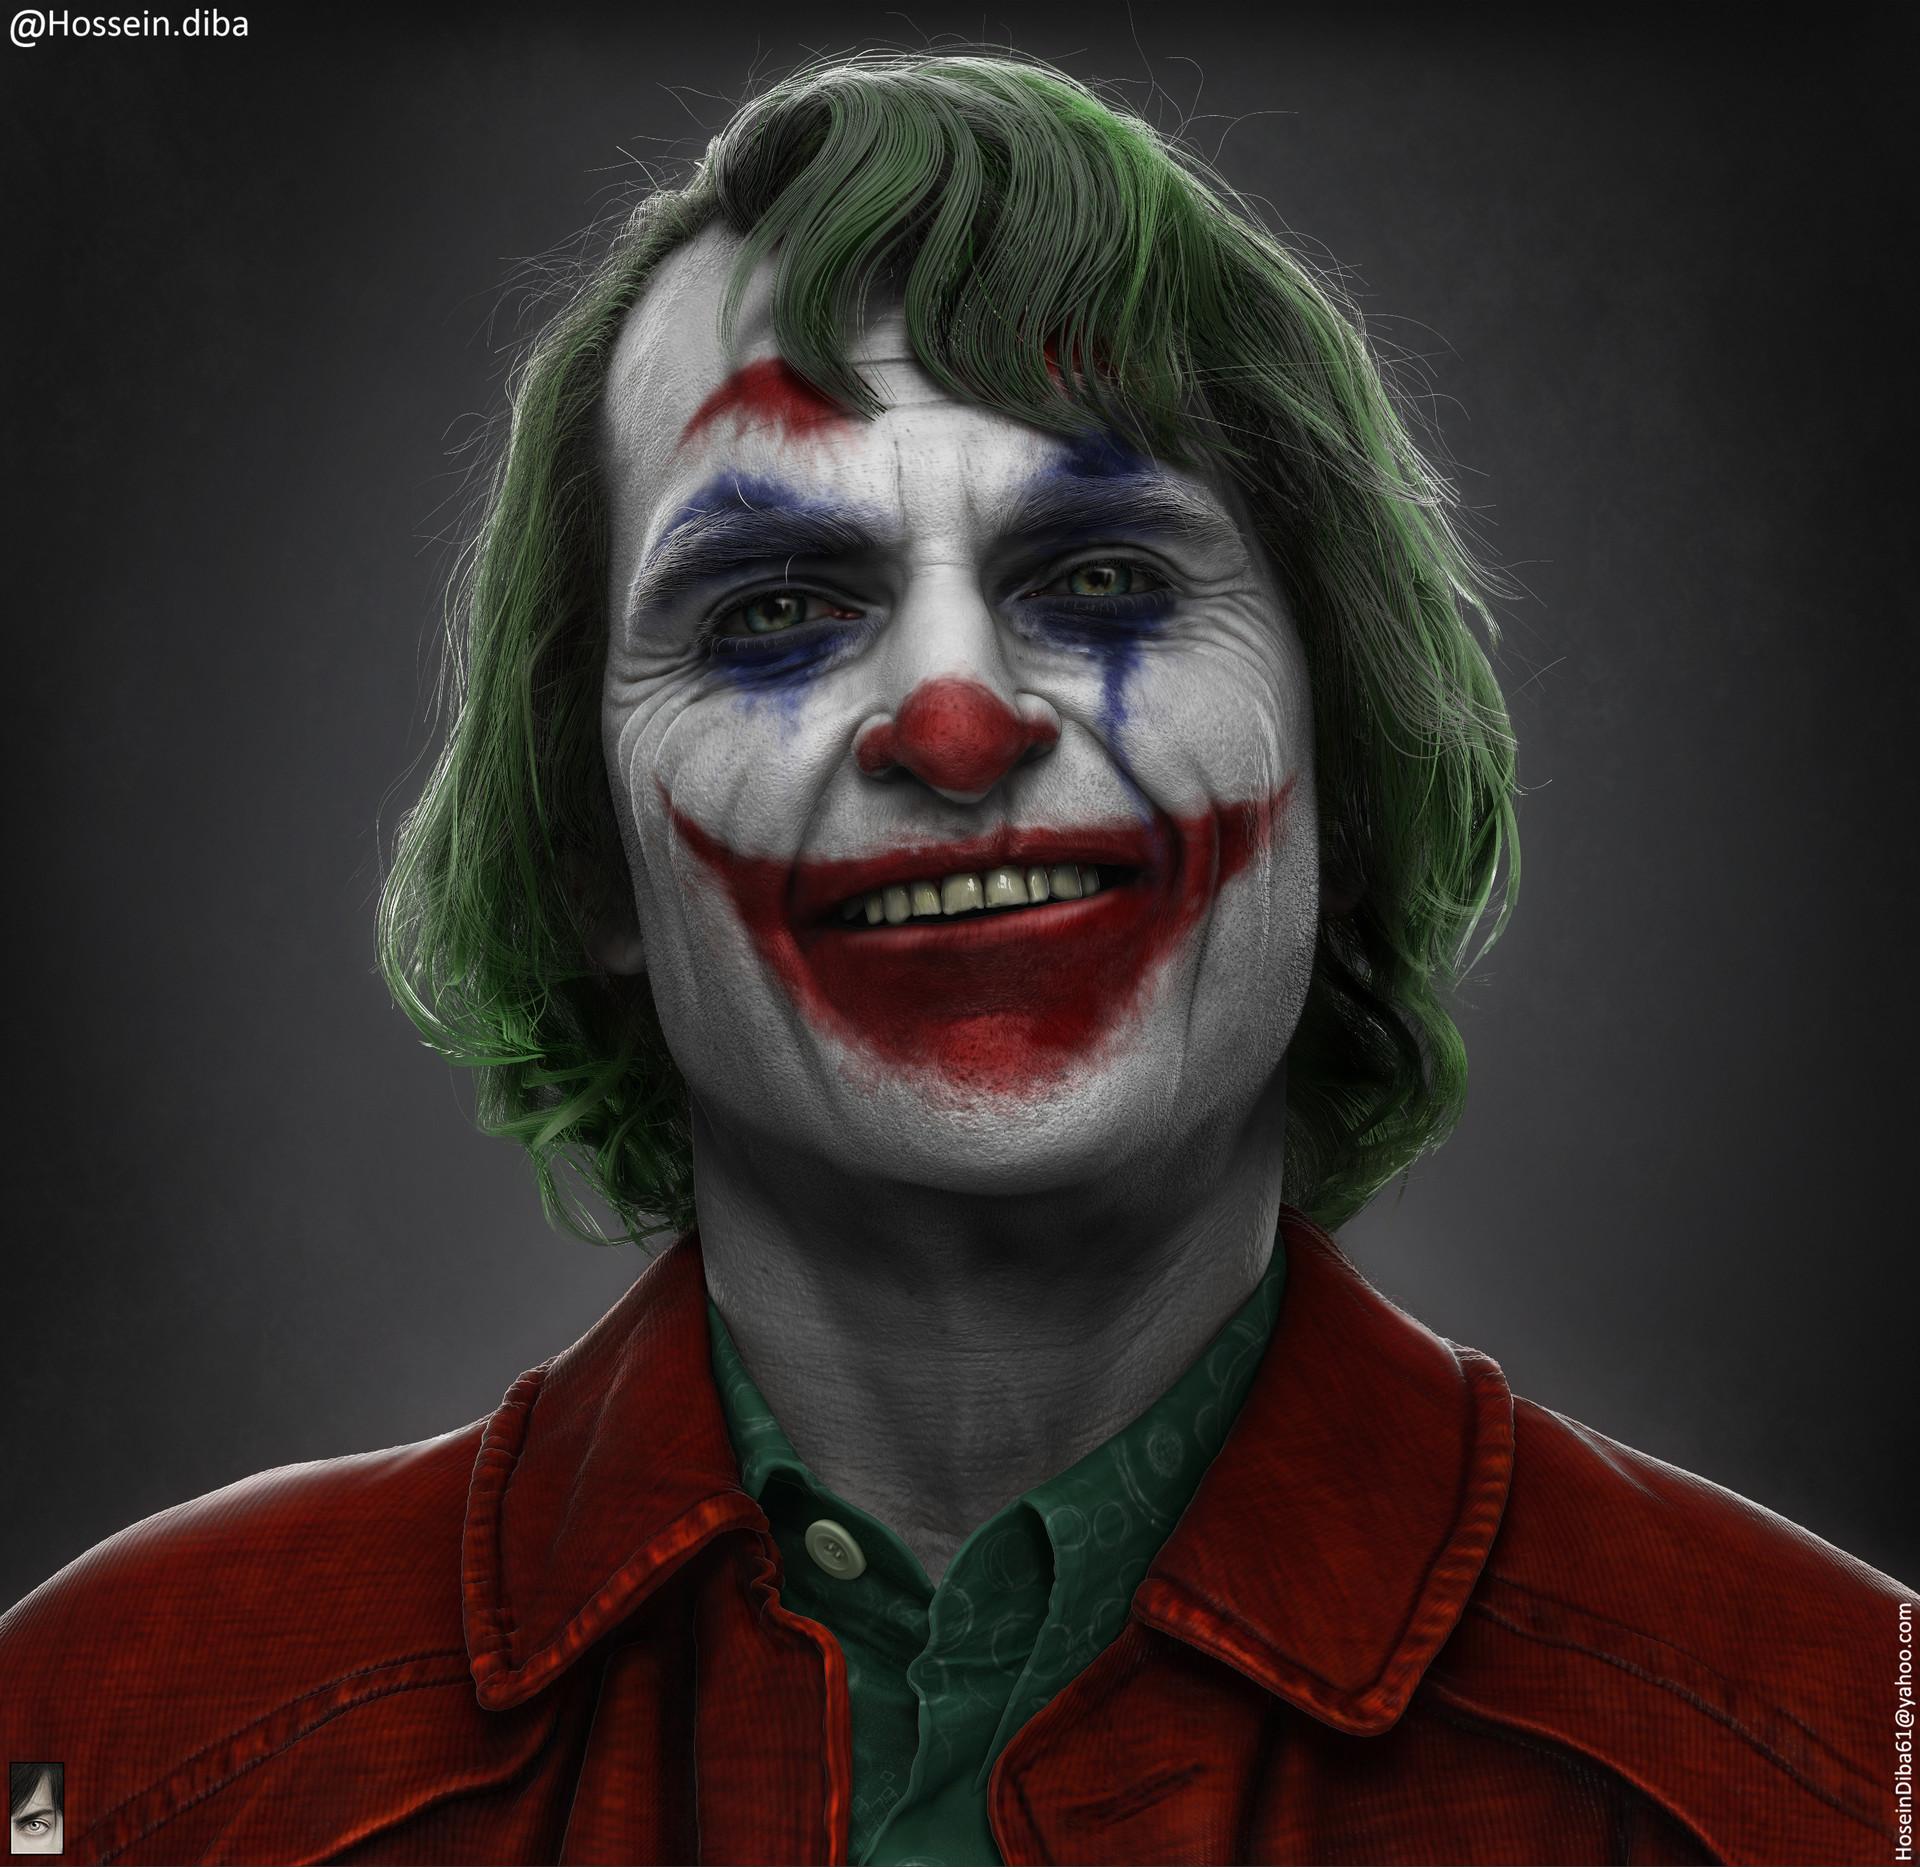 Artstation Joker Joaquin Phoenix Hossein Diba